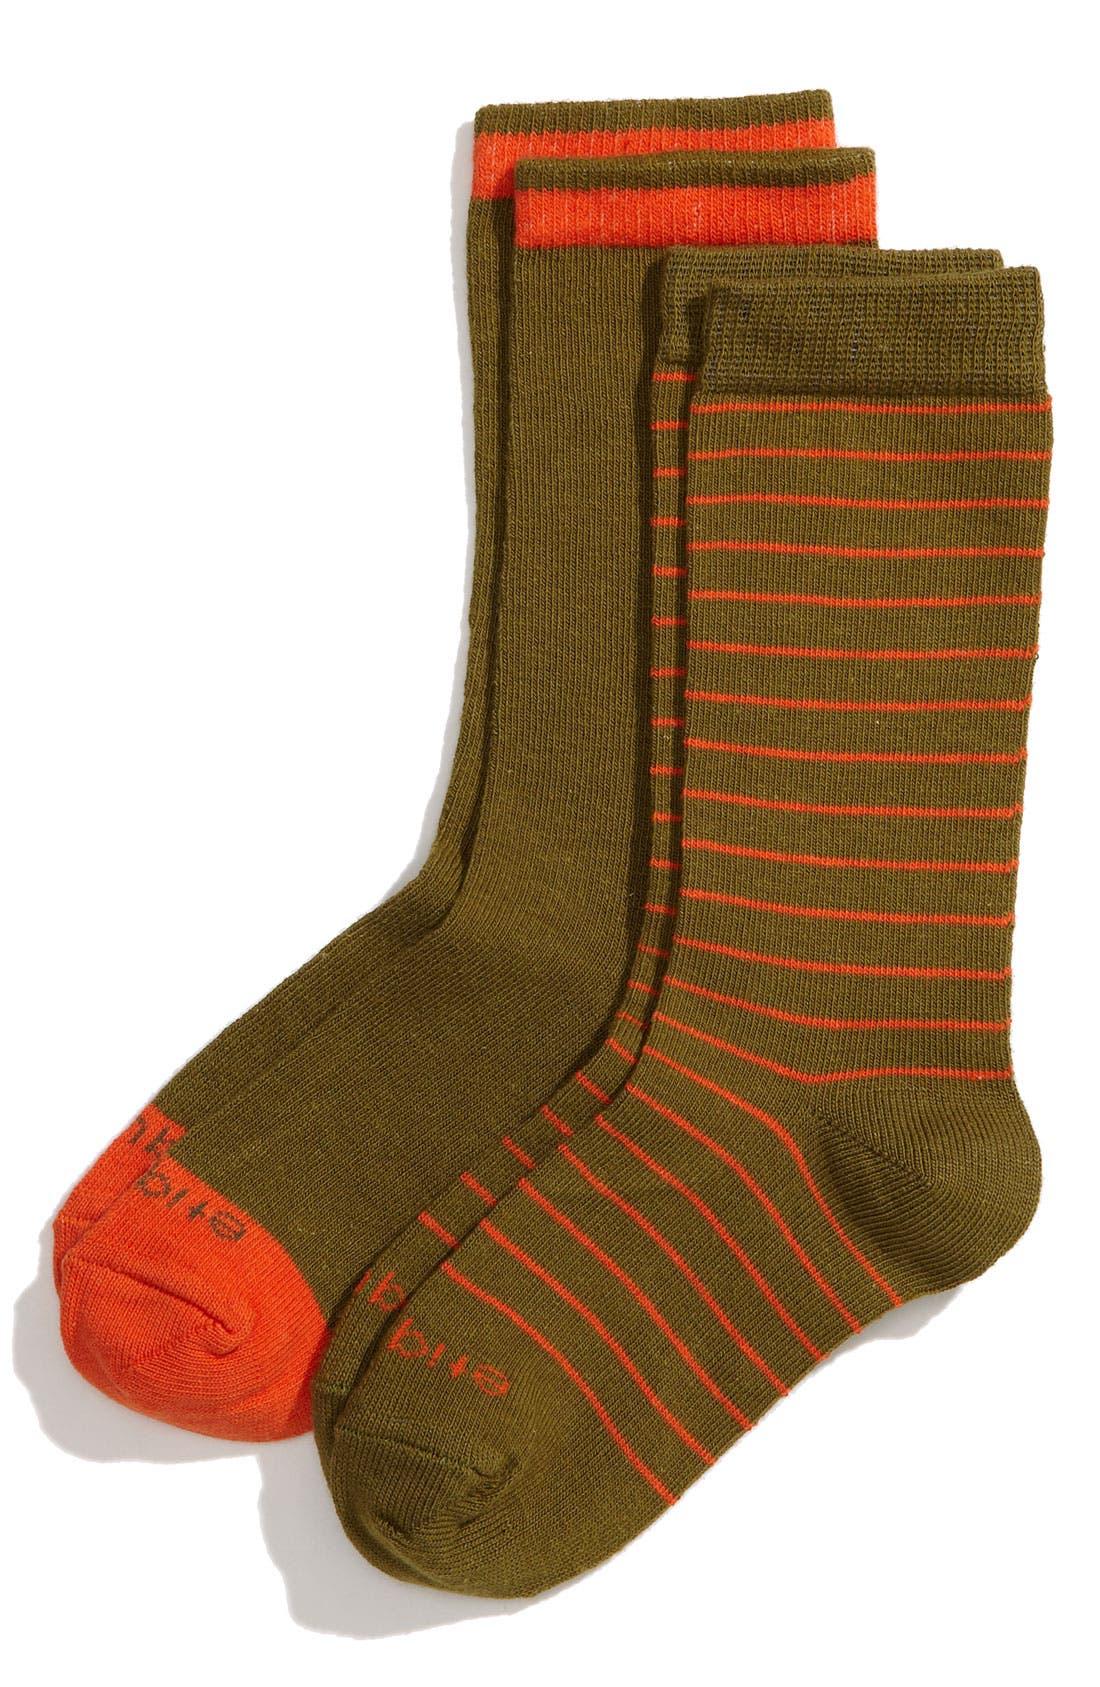 Alternate Image 1 Selected - Etiquette Clothiers 'Needle Stripe' Socks (2-Pack) (Toddler & Little Kid)